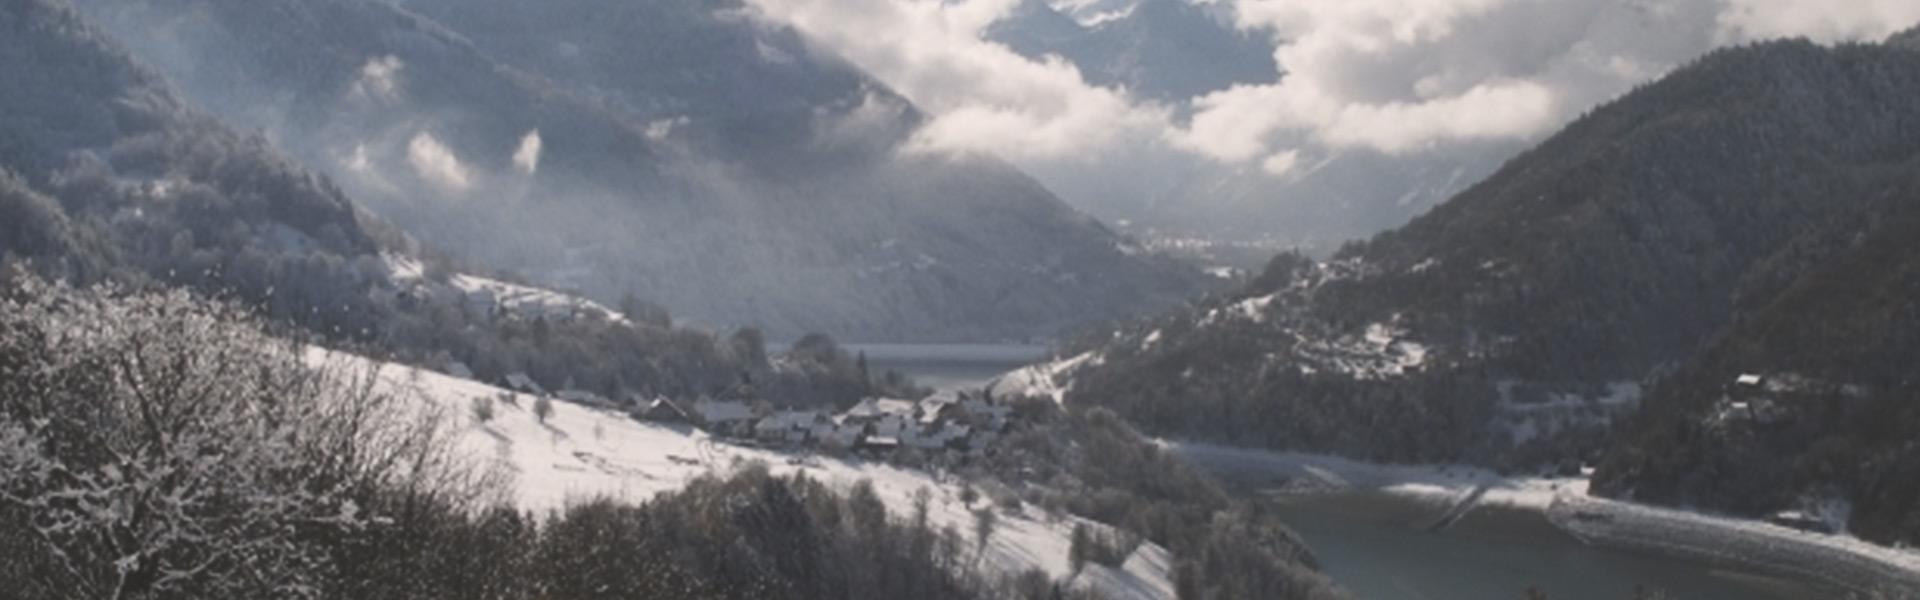 Back Mountain Lodge